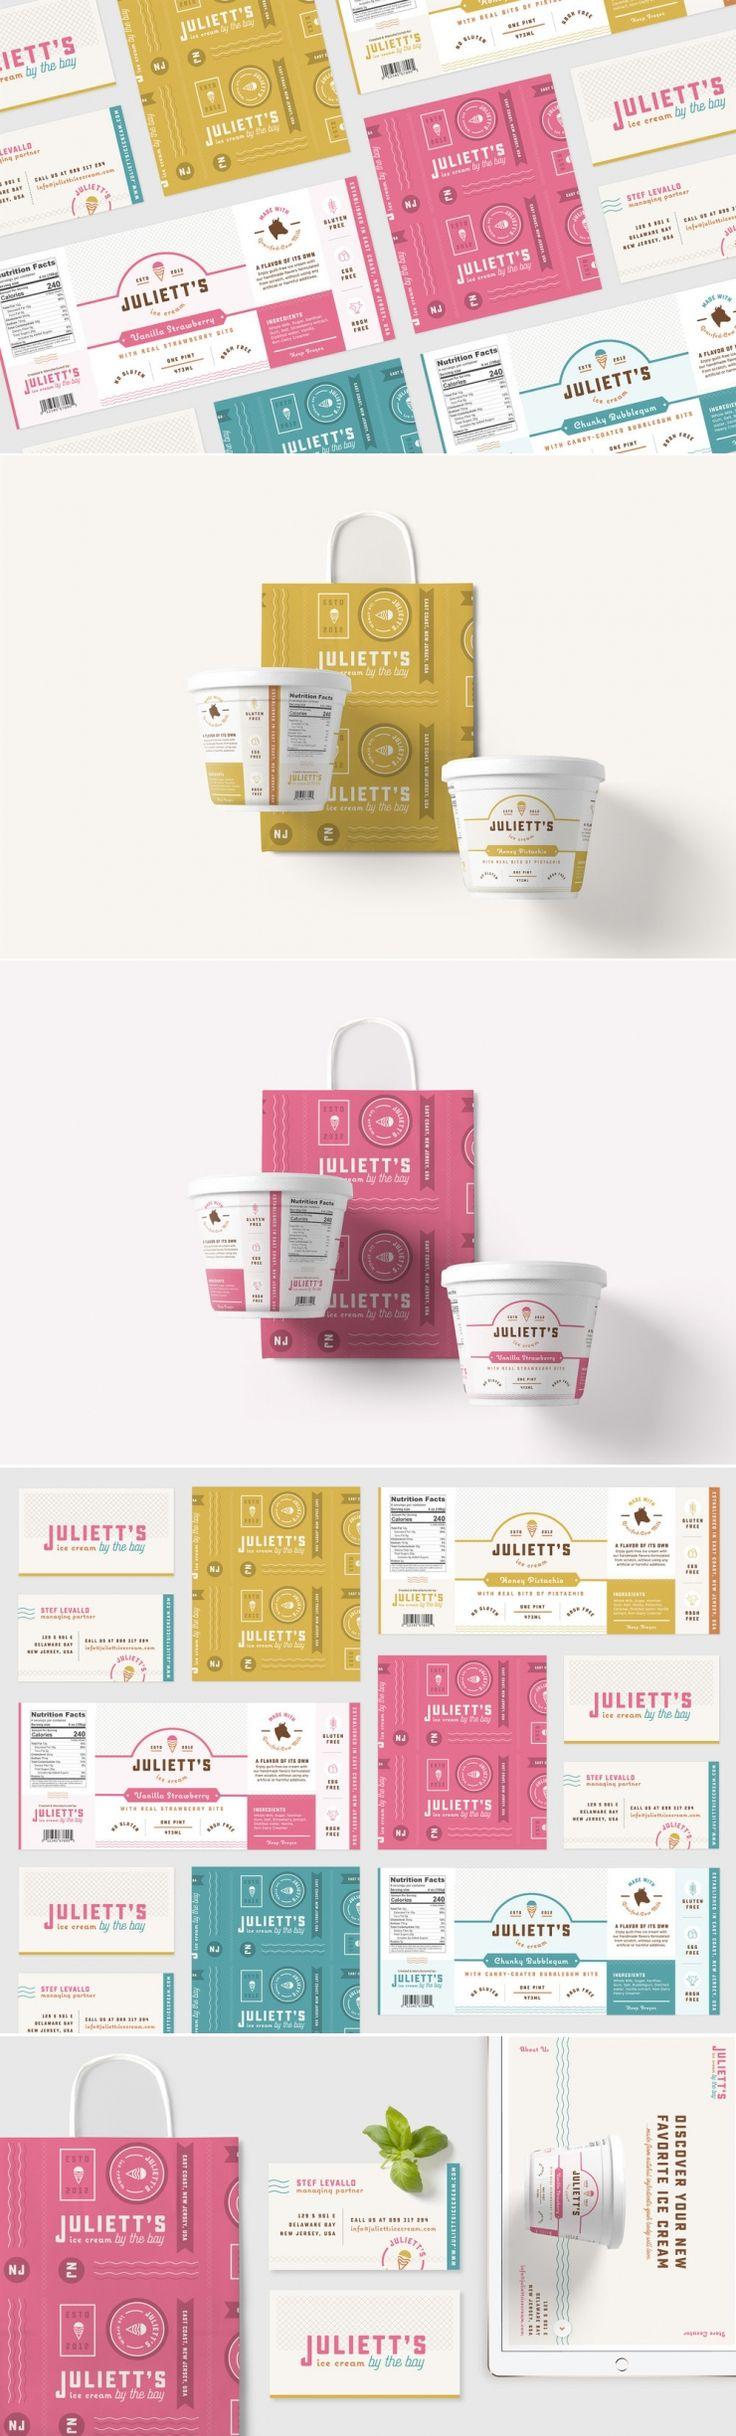 Concept: Juliett's Ice Cream — The Dieline | Packaging & Branding Design & Innovation News